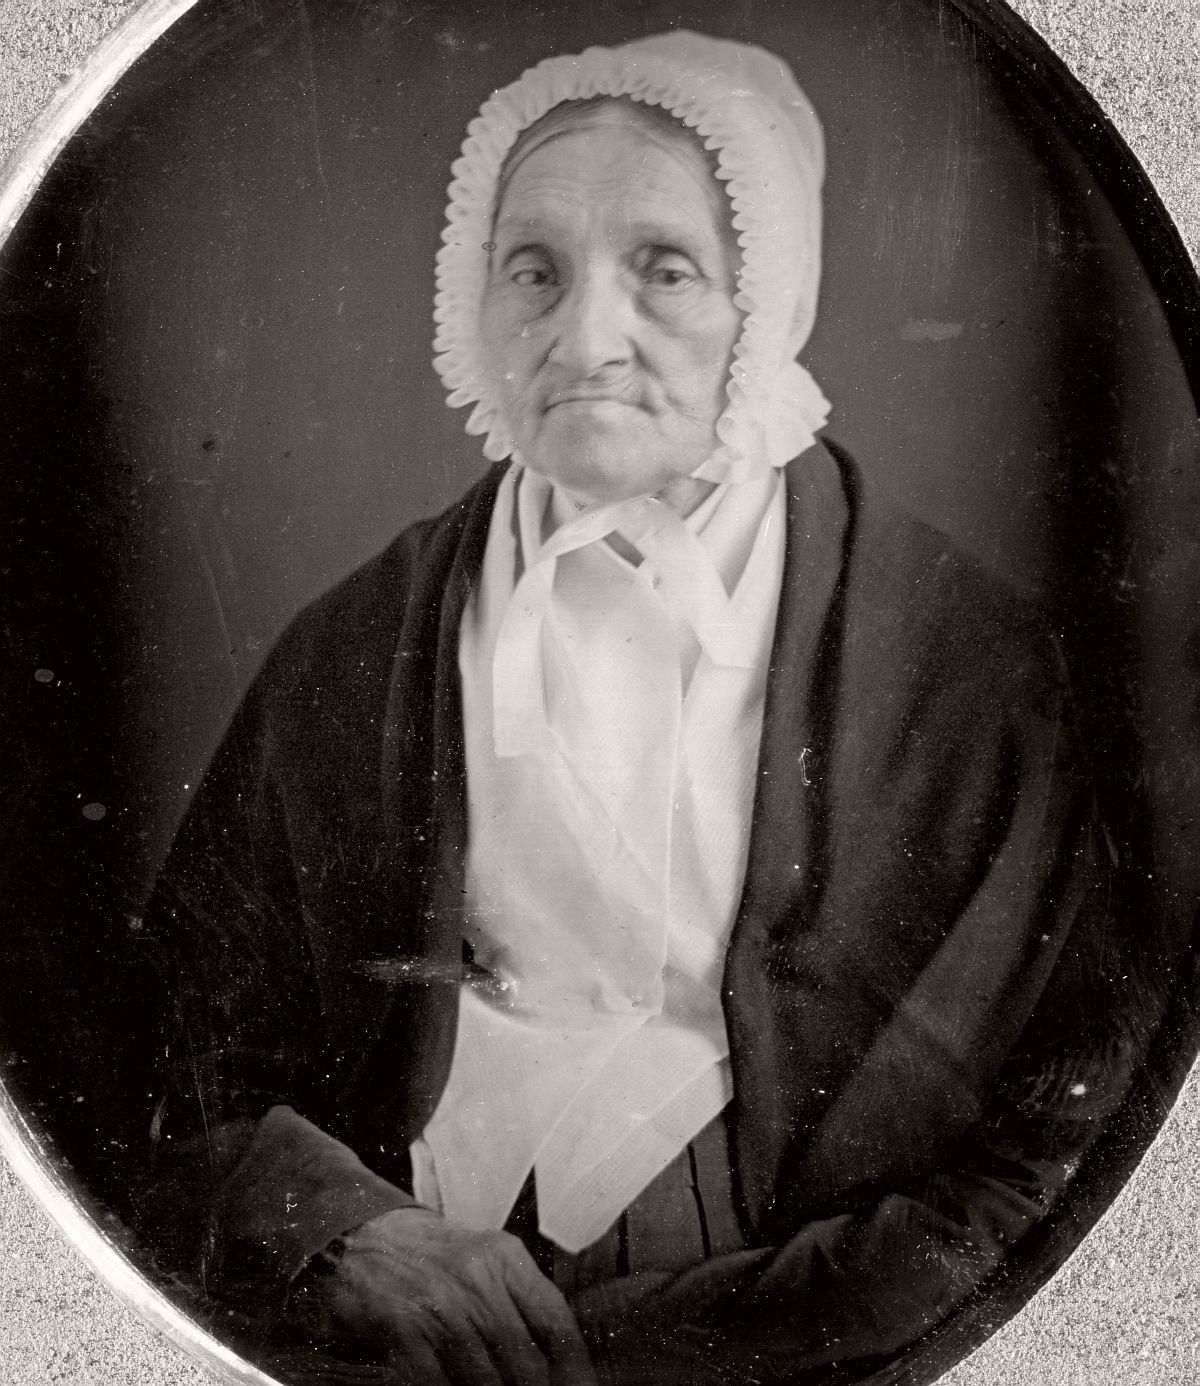 daguerreotype-portrait-people-born-in-the-late-18th-xviii-century-1700s-vintage-25